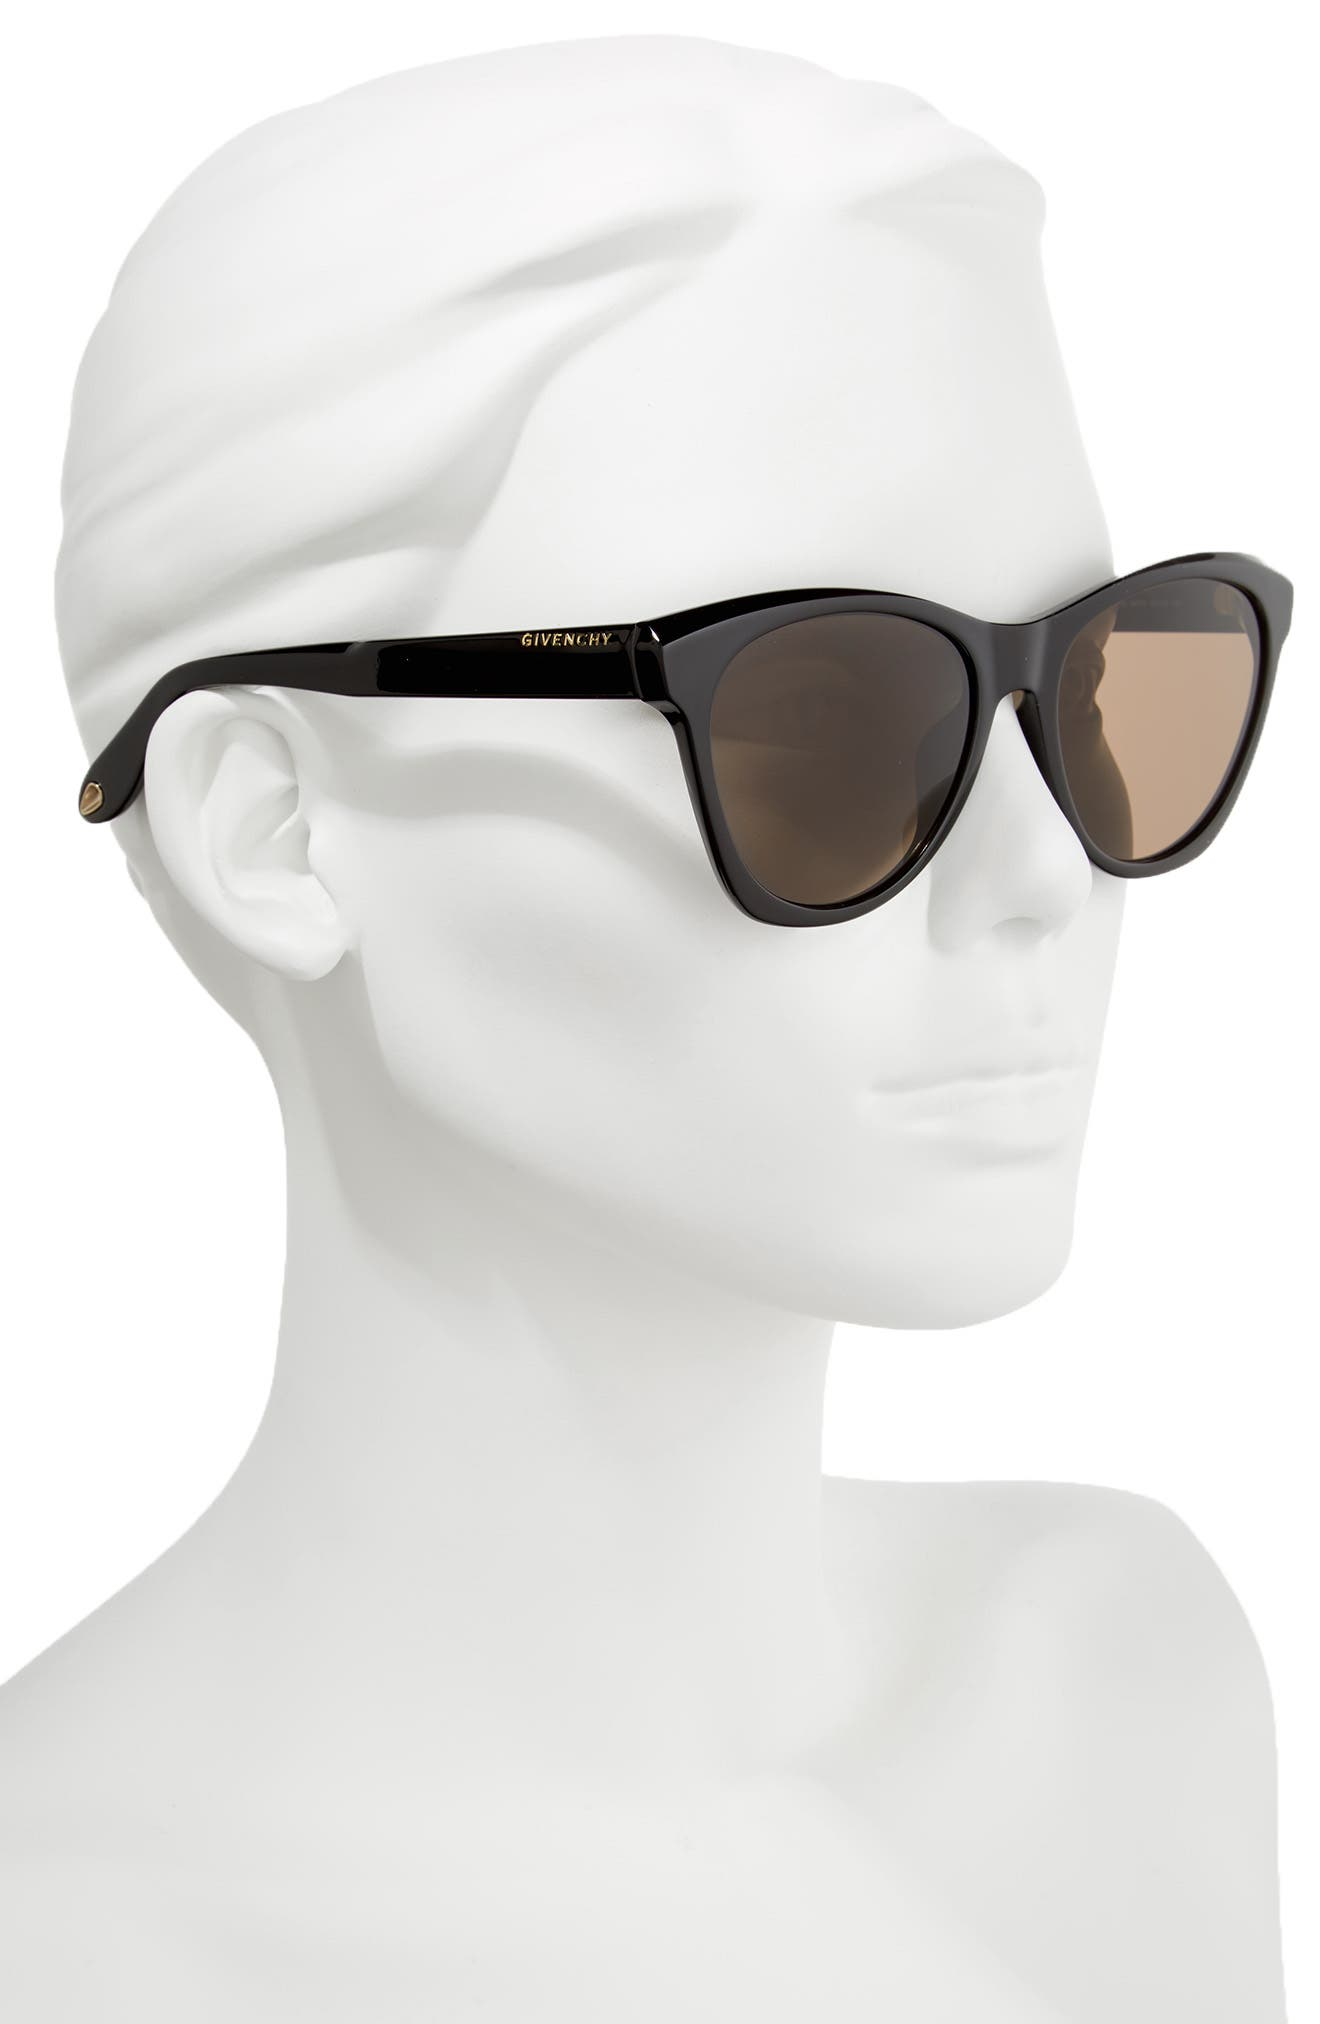 55mm Cat Eye Sunglasses,                             Alternate thumbnail 2, color,                             001